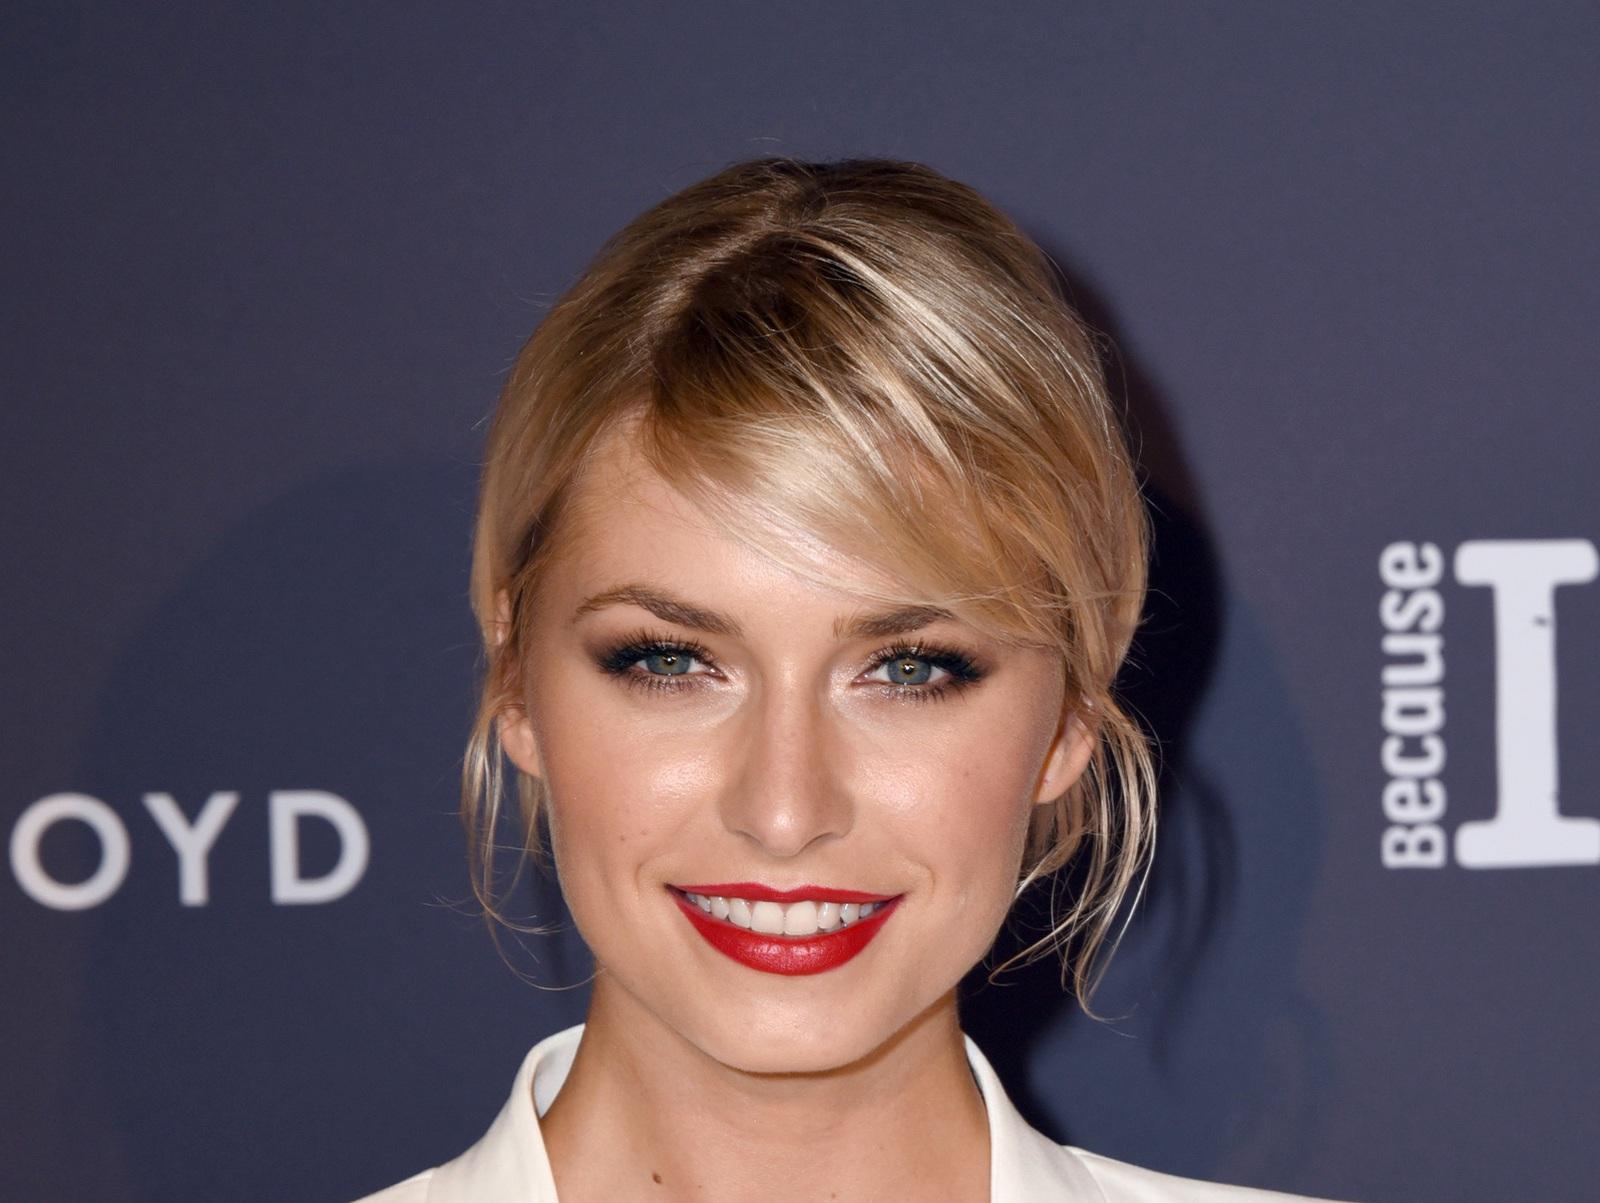 Gut Bestuckt Betty Taube Verrat Intimes Uber Koray Gunter Stars